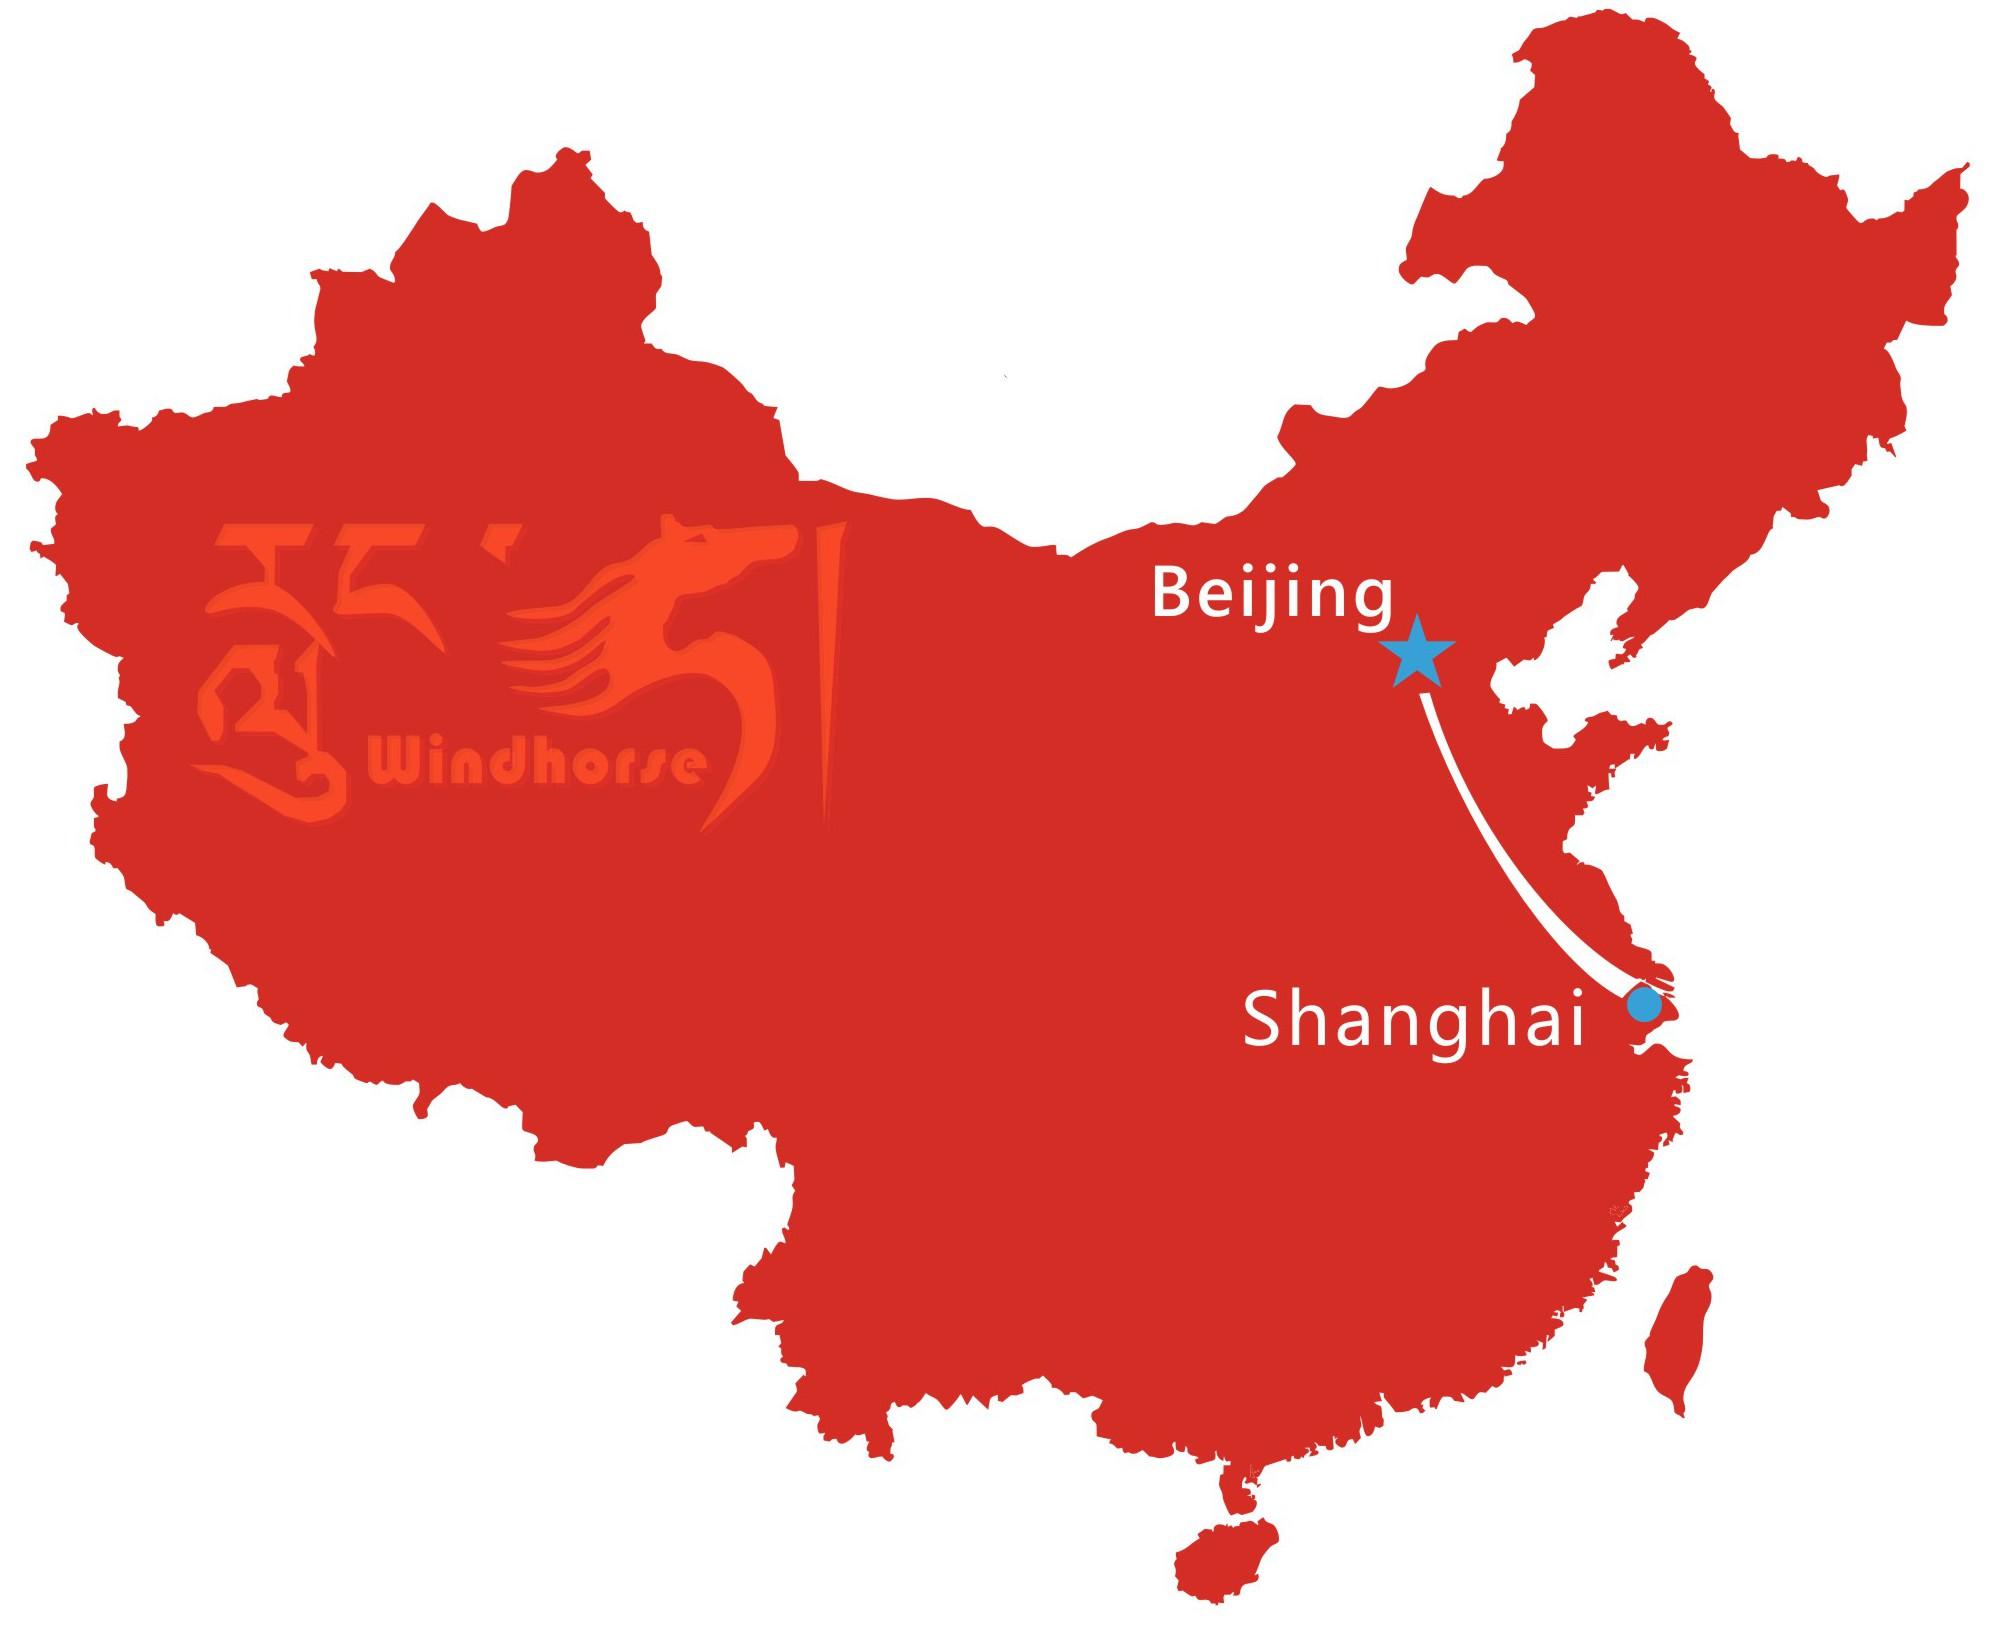 Beijing Shanghai Tour Map